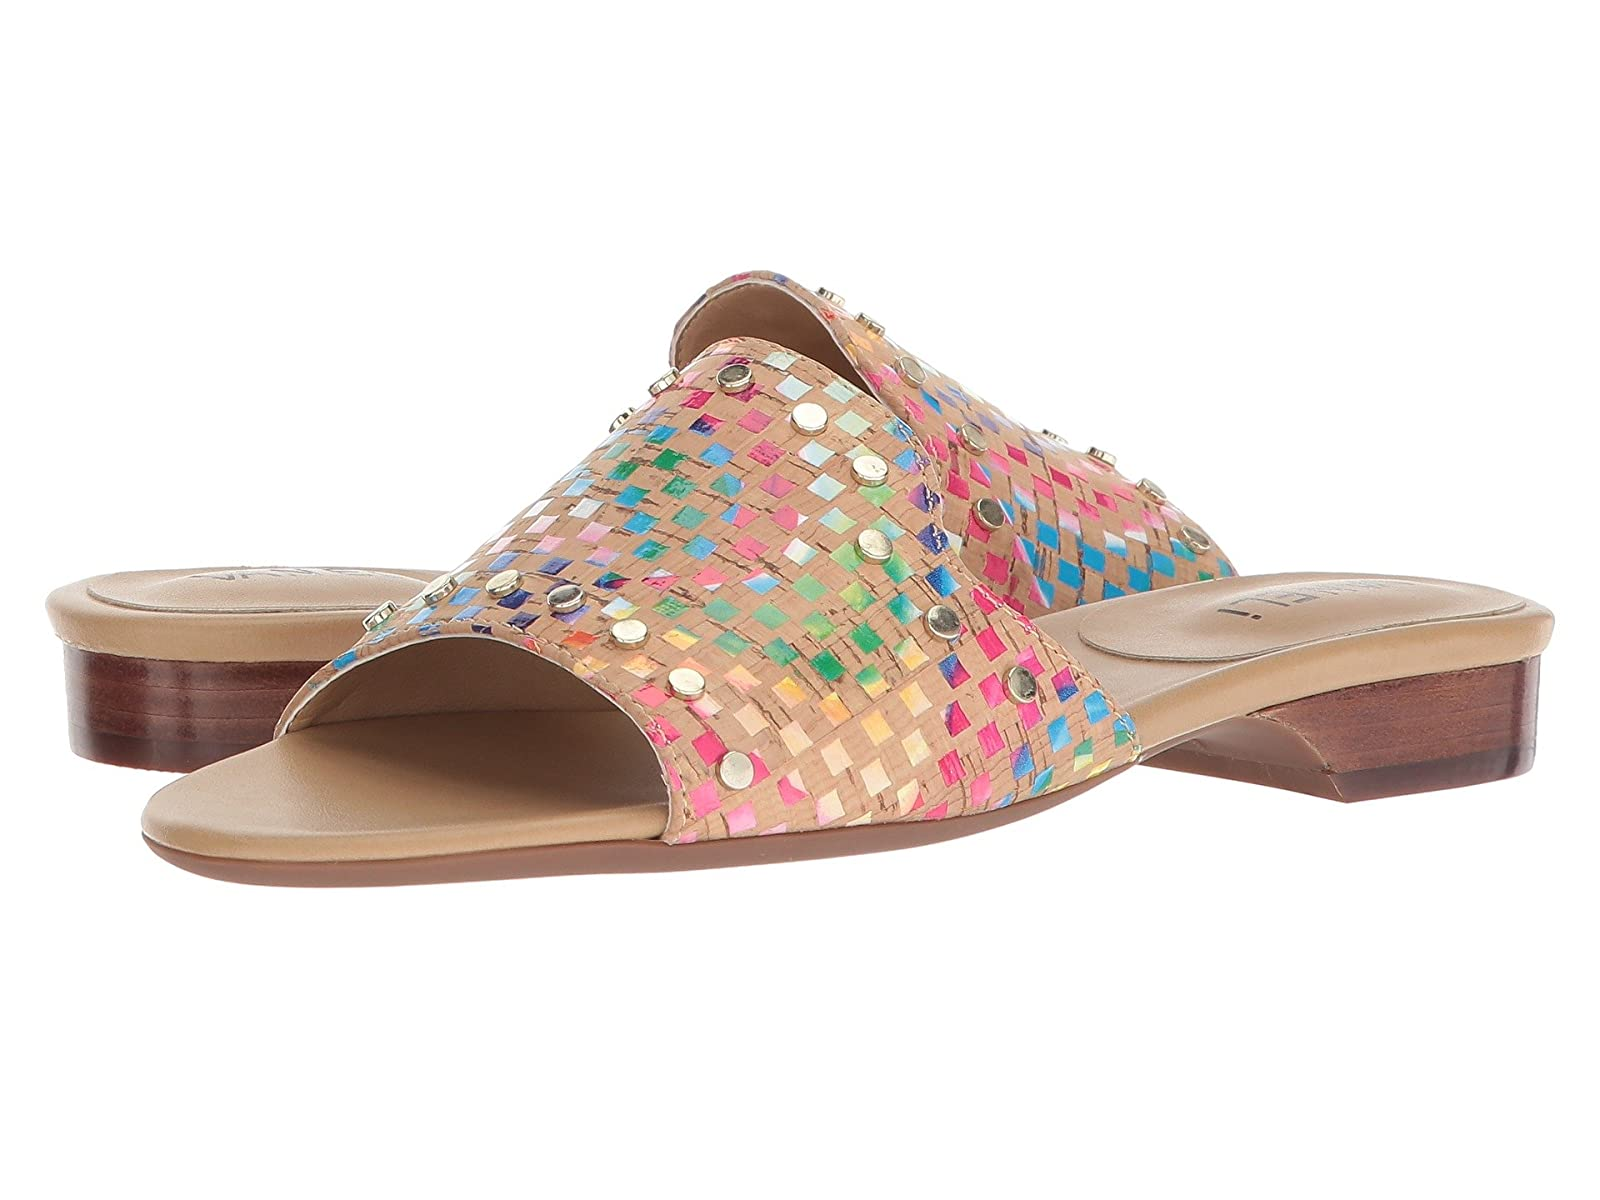 Vaneli BonetCheap and distinctive eye-catching shoes